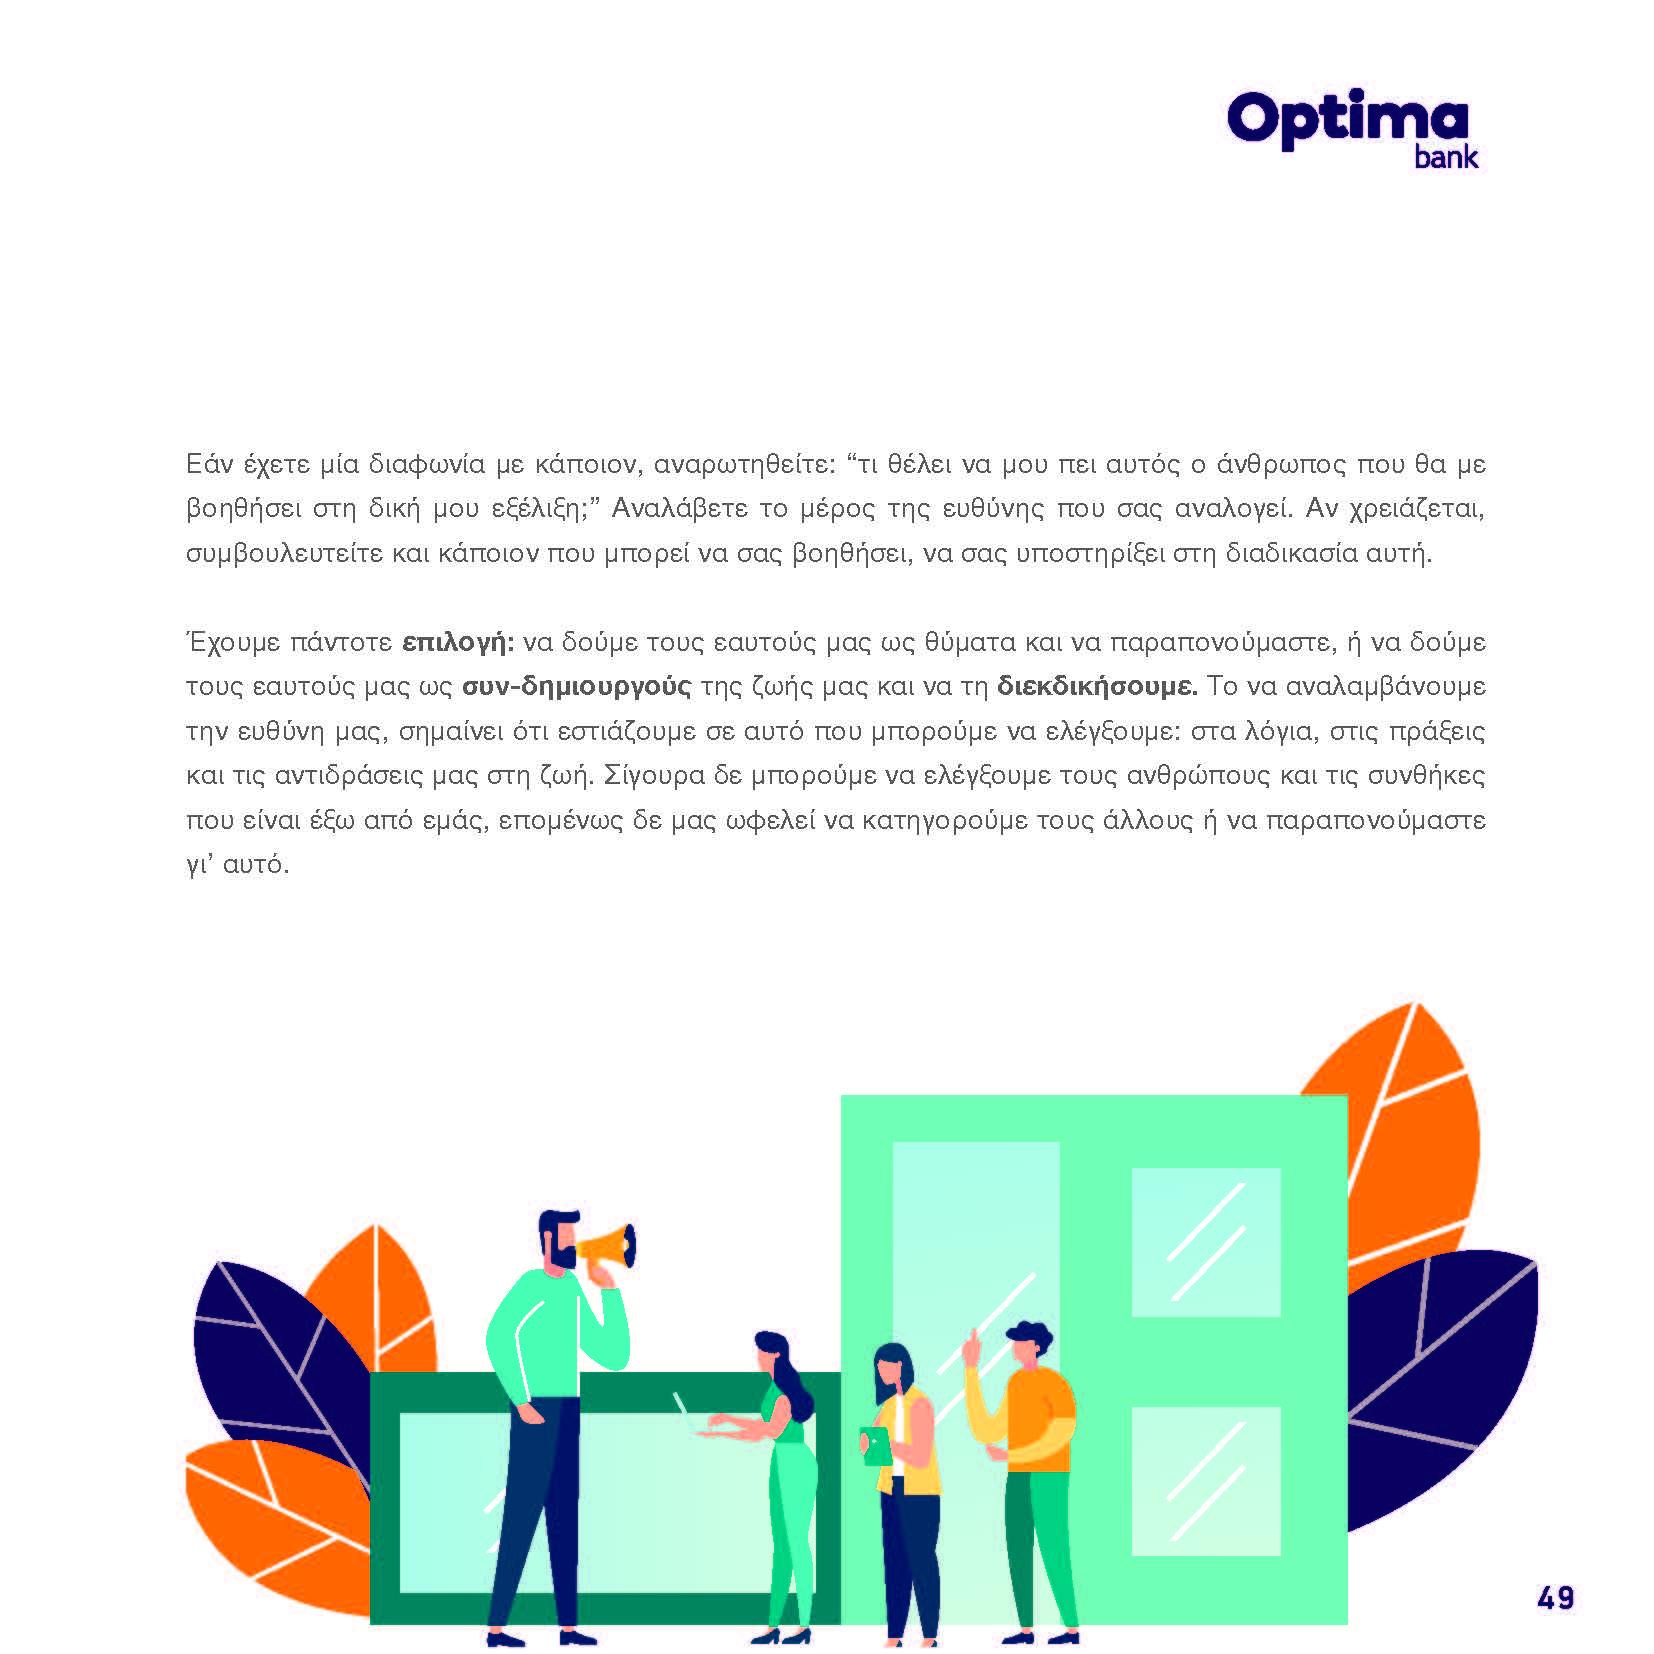 https://www.jib.gr/wp-content/uploads/2020/09/OPTIMA-BANK-BOOKLET-WEB_Page_049.jpg